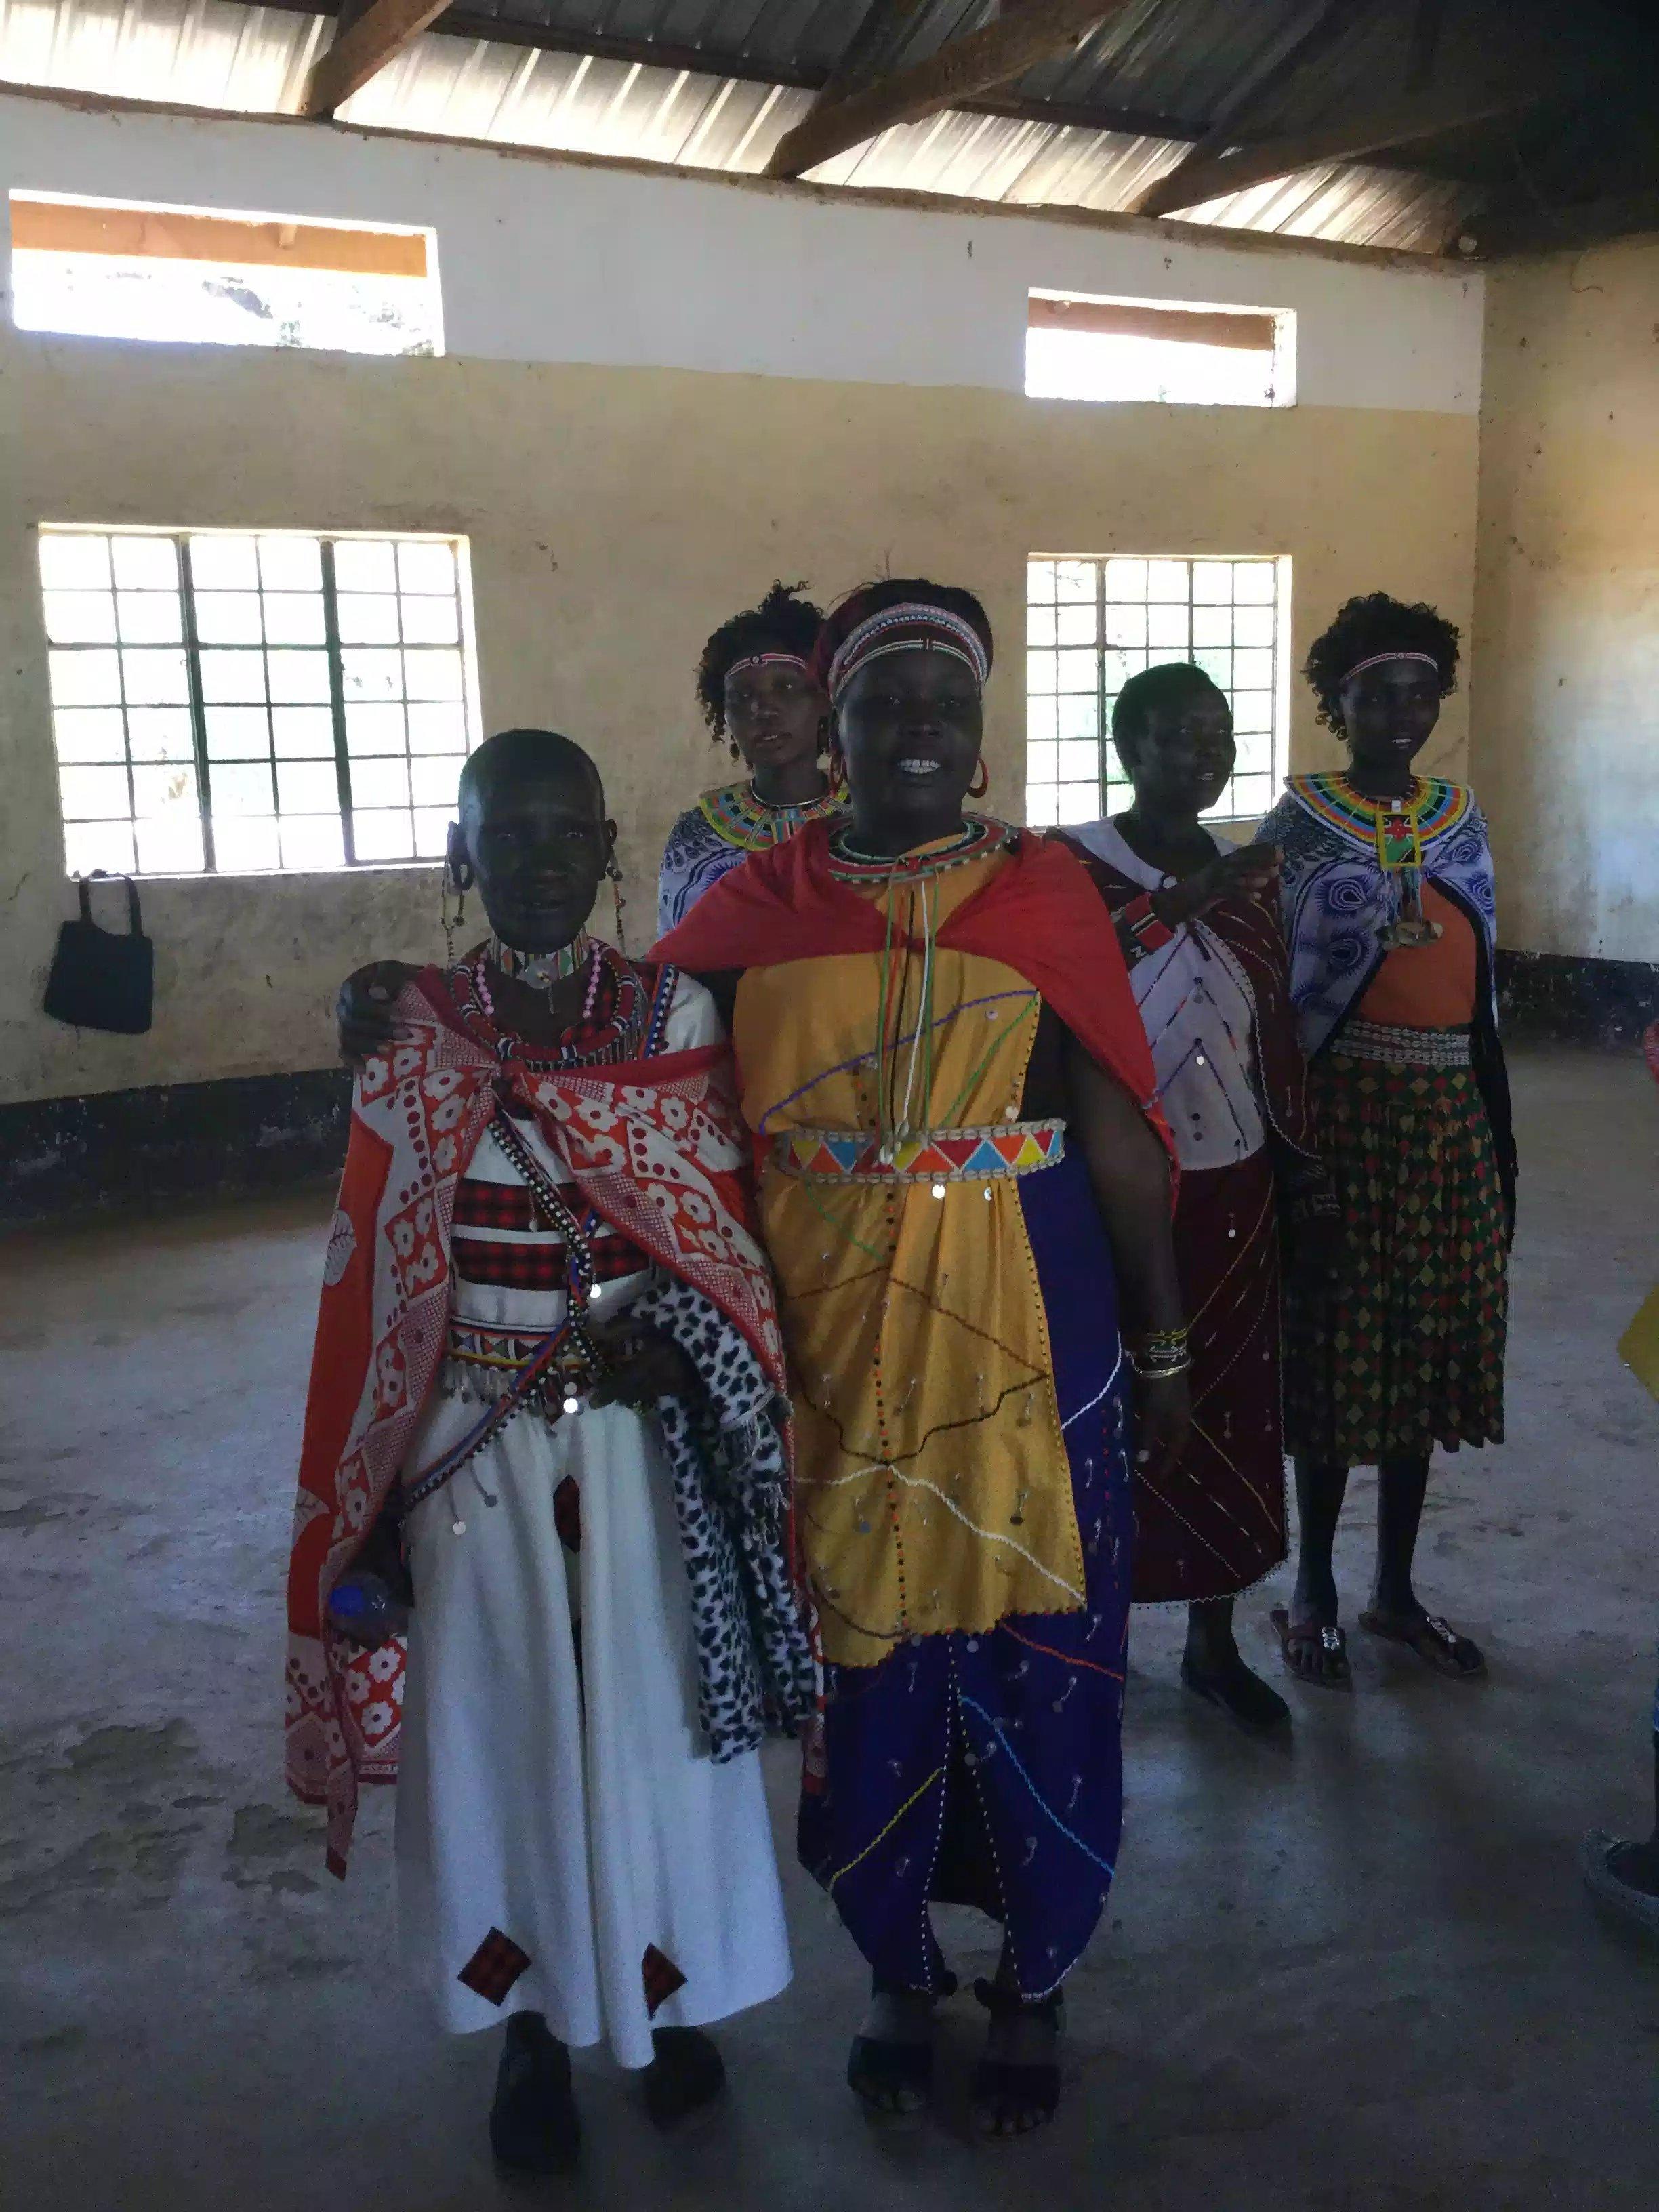 http://indigenouswomen-africa.org/wp-content/uploads/2018/03/image-33567.jpeg